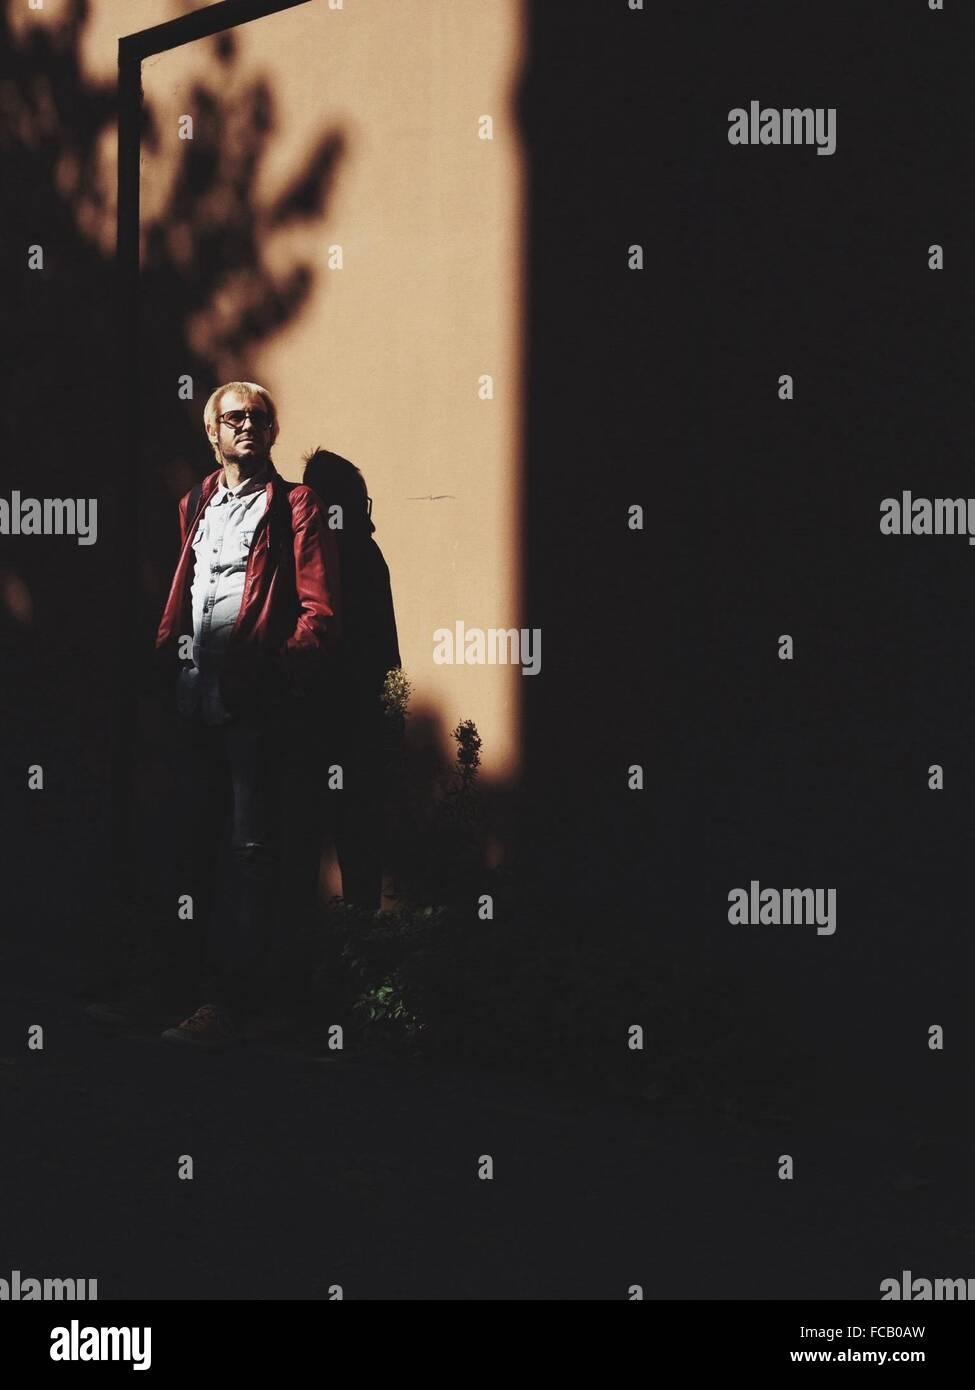 Full Length Of Man Standing At Street - Stock Image